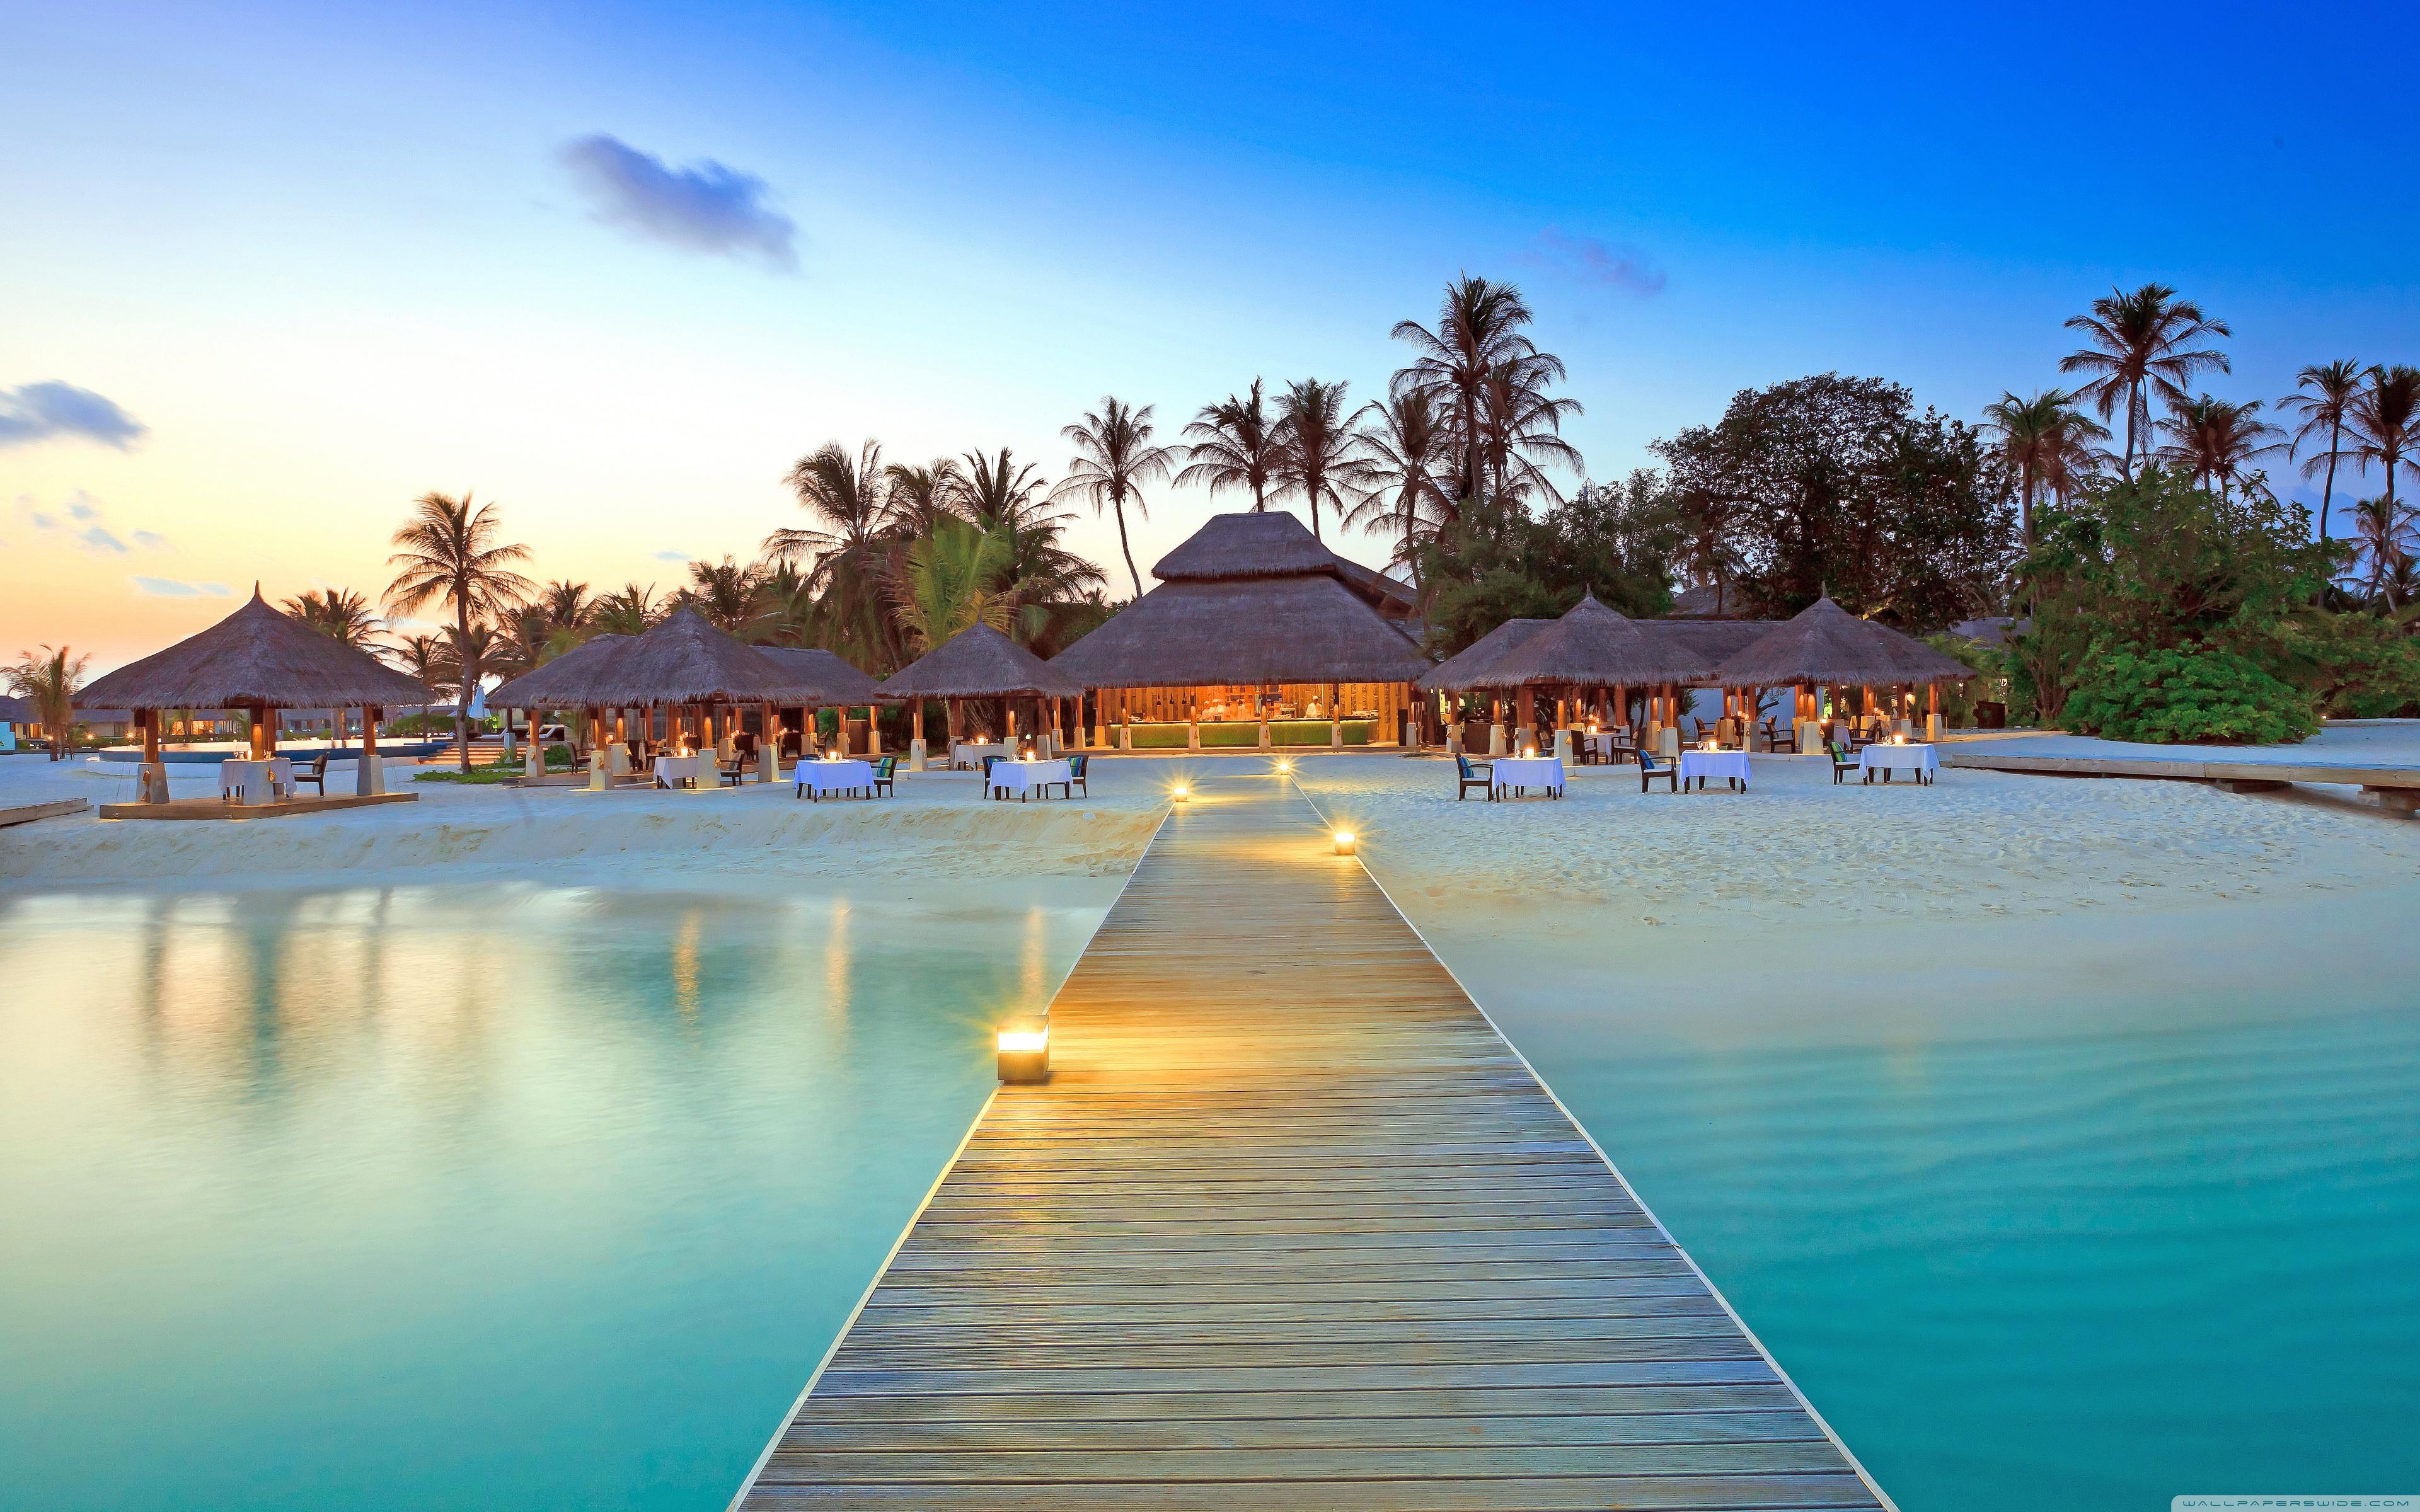 Maldive Islands Resort 4K HD Desktop Wallpaper for 4K Ultra HD 3840x2400